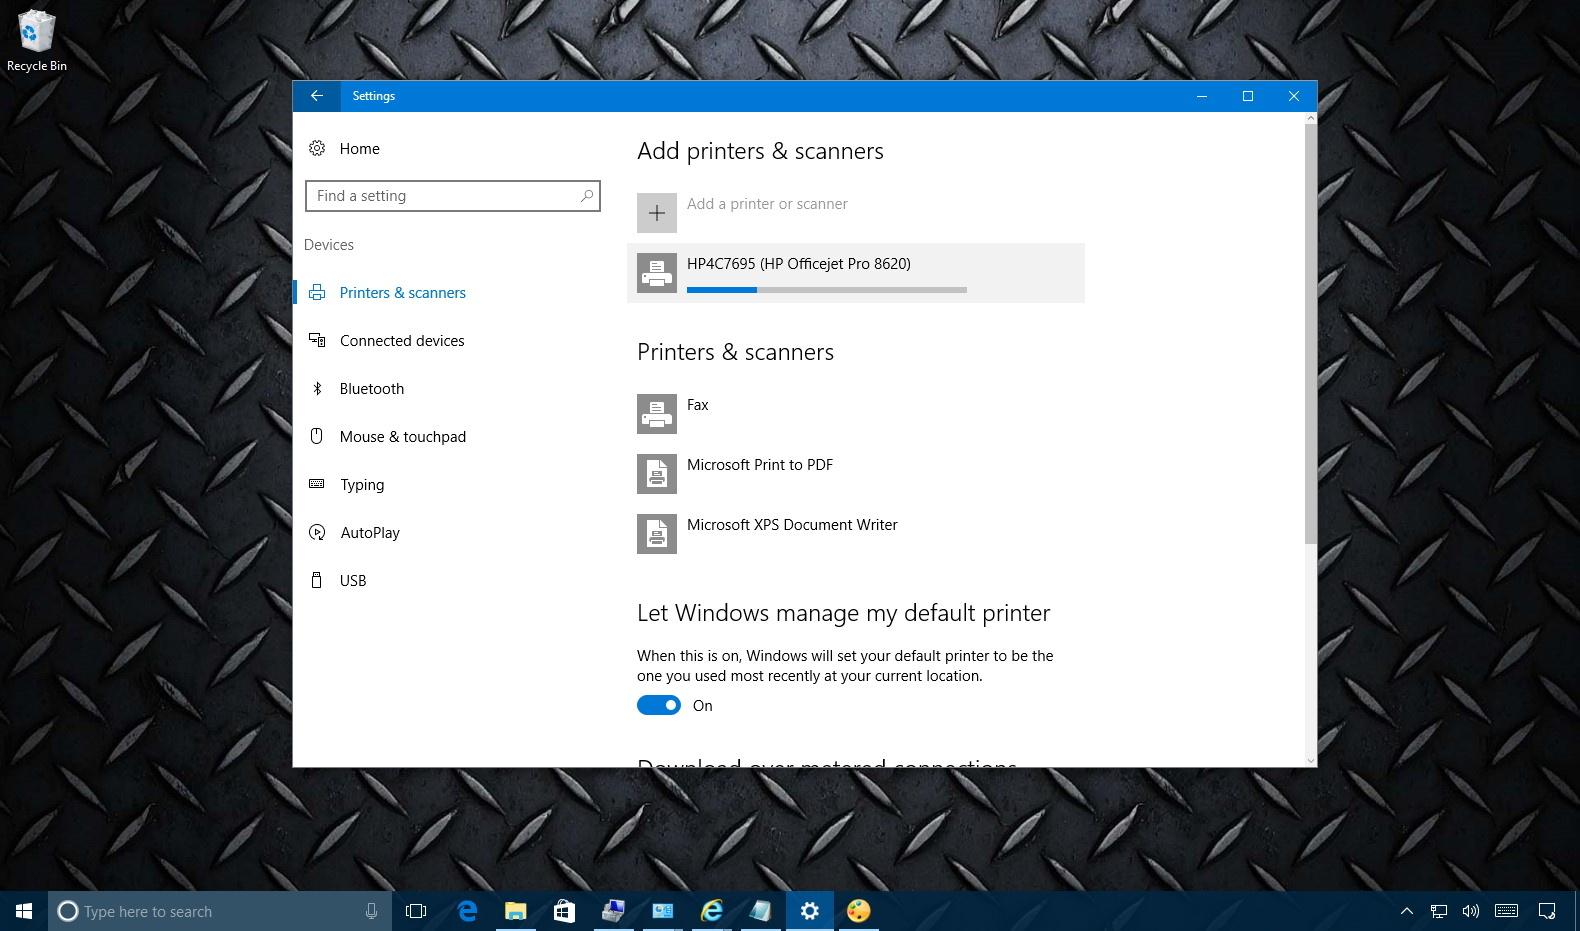 Install wireless printer on Windows 10